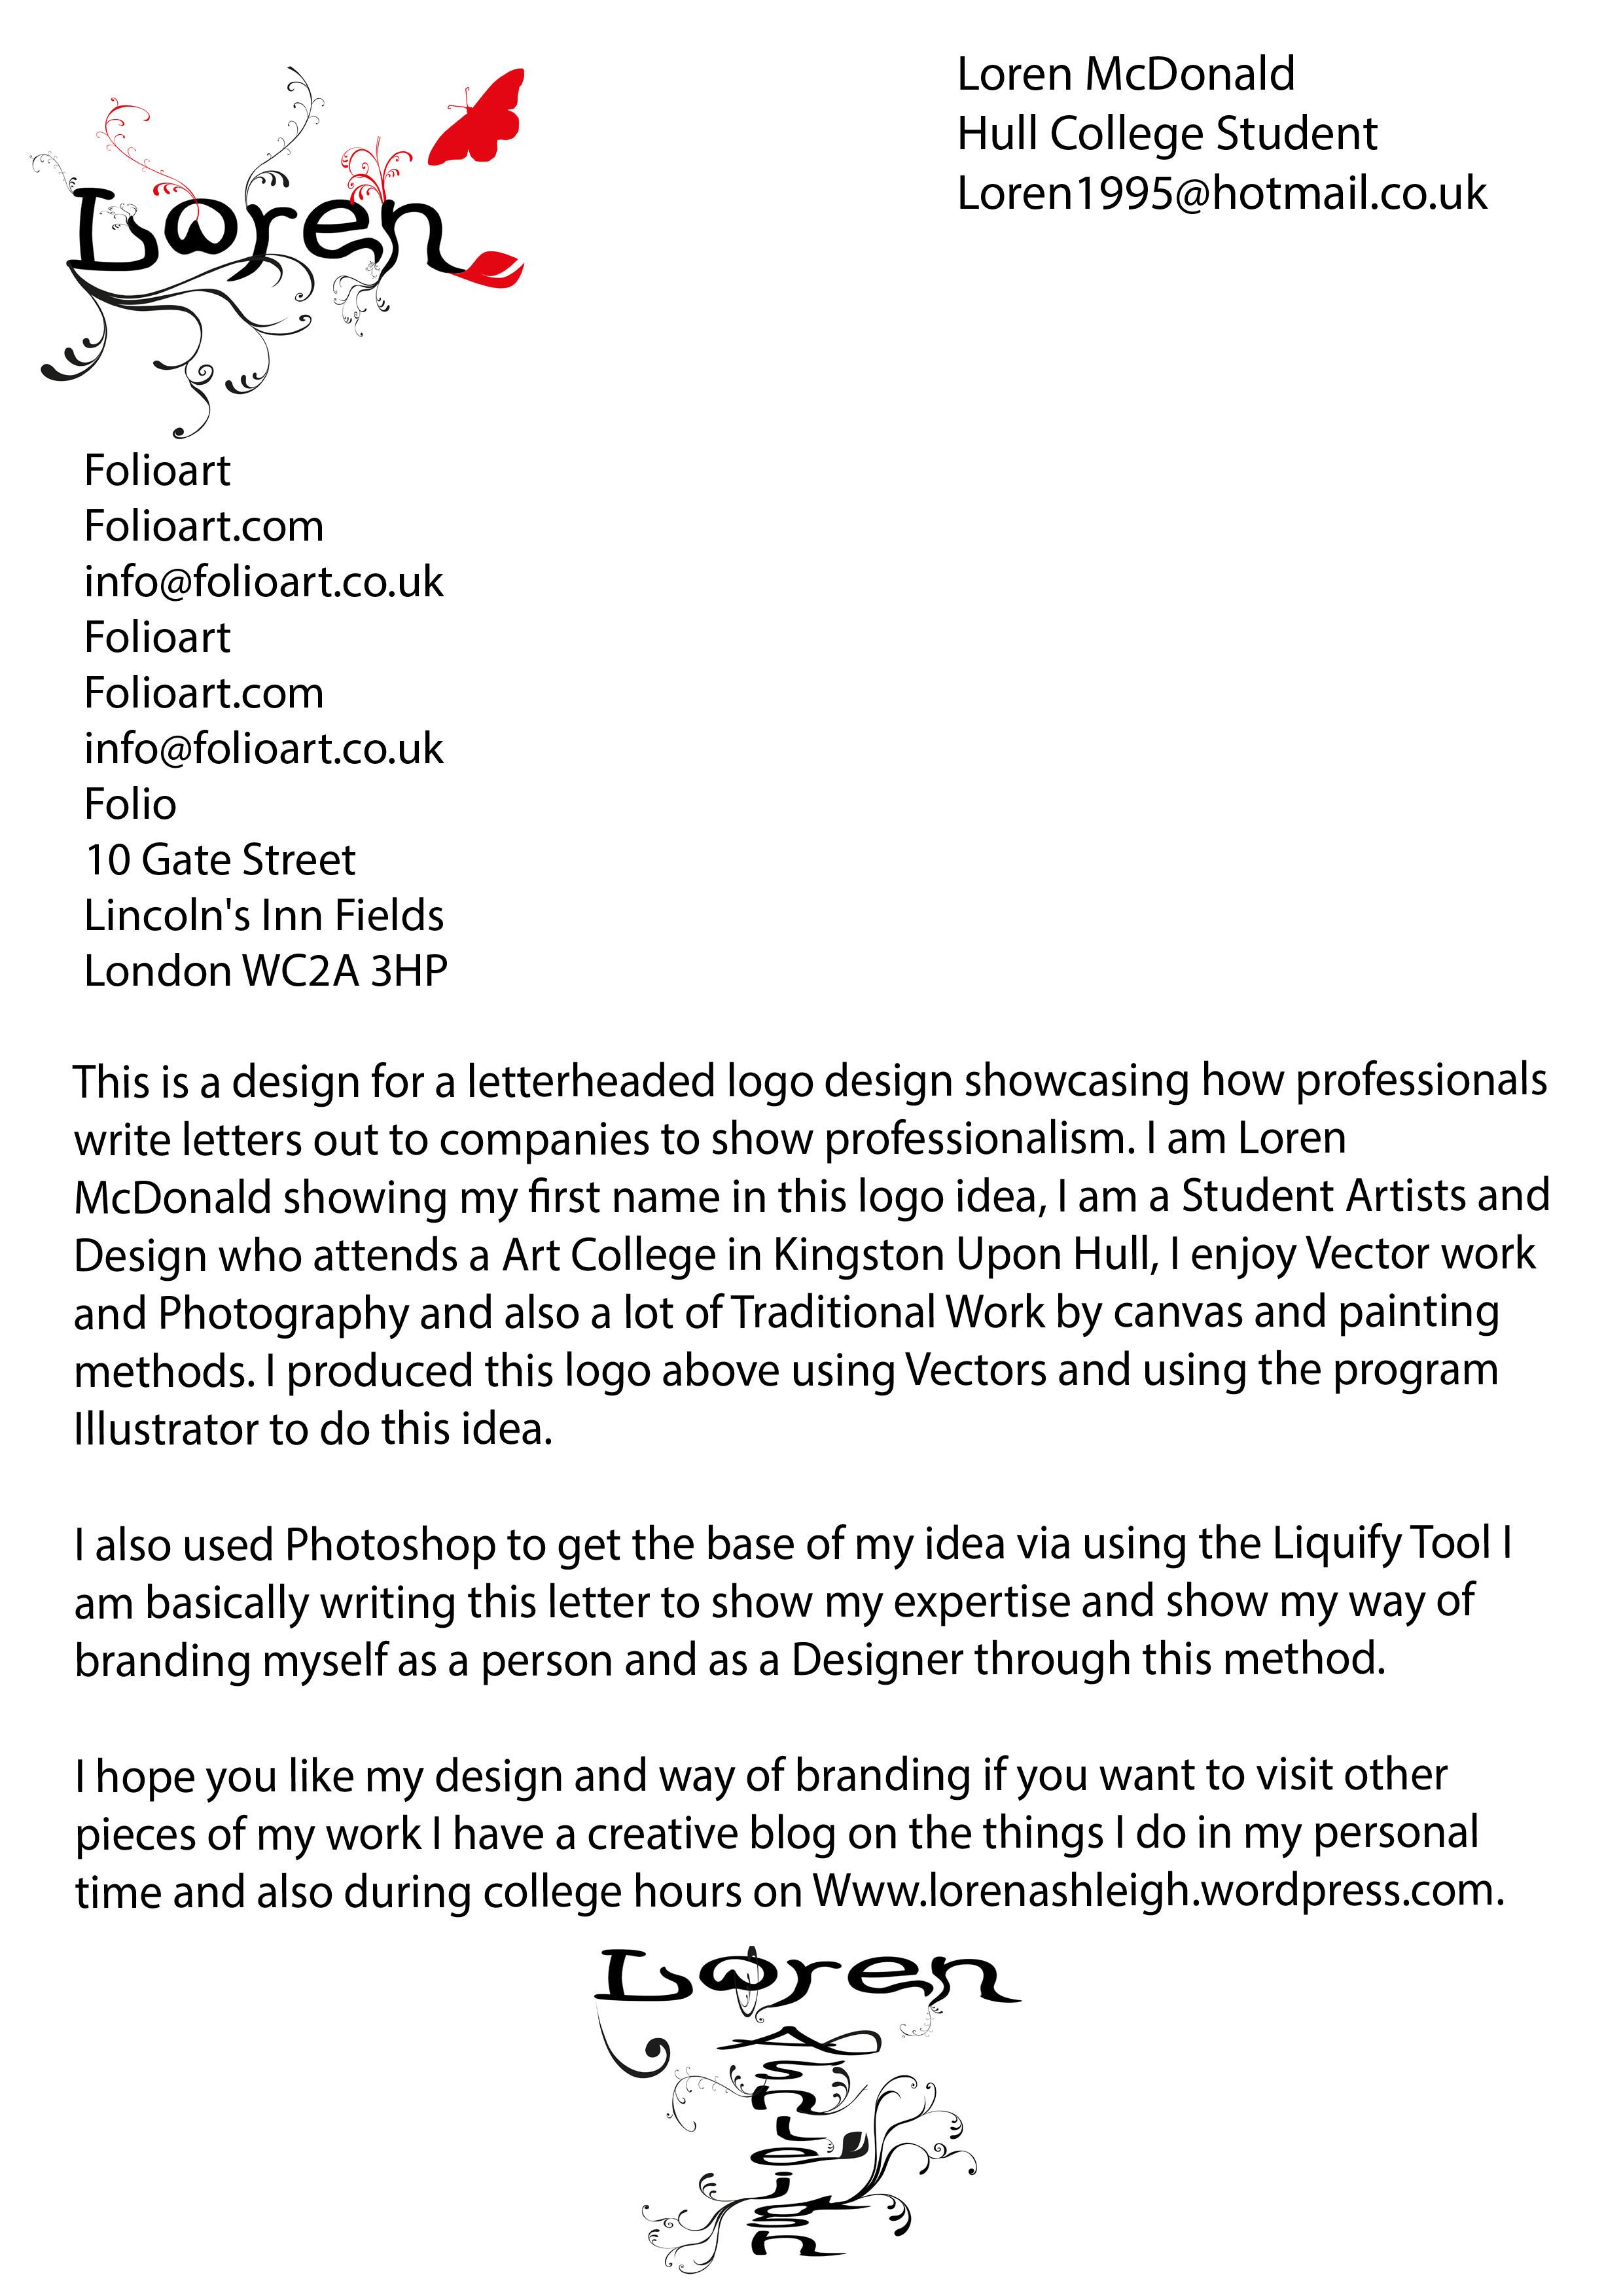 Business letter format with logos spiritdancerdesigns Images